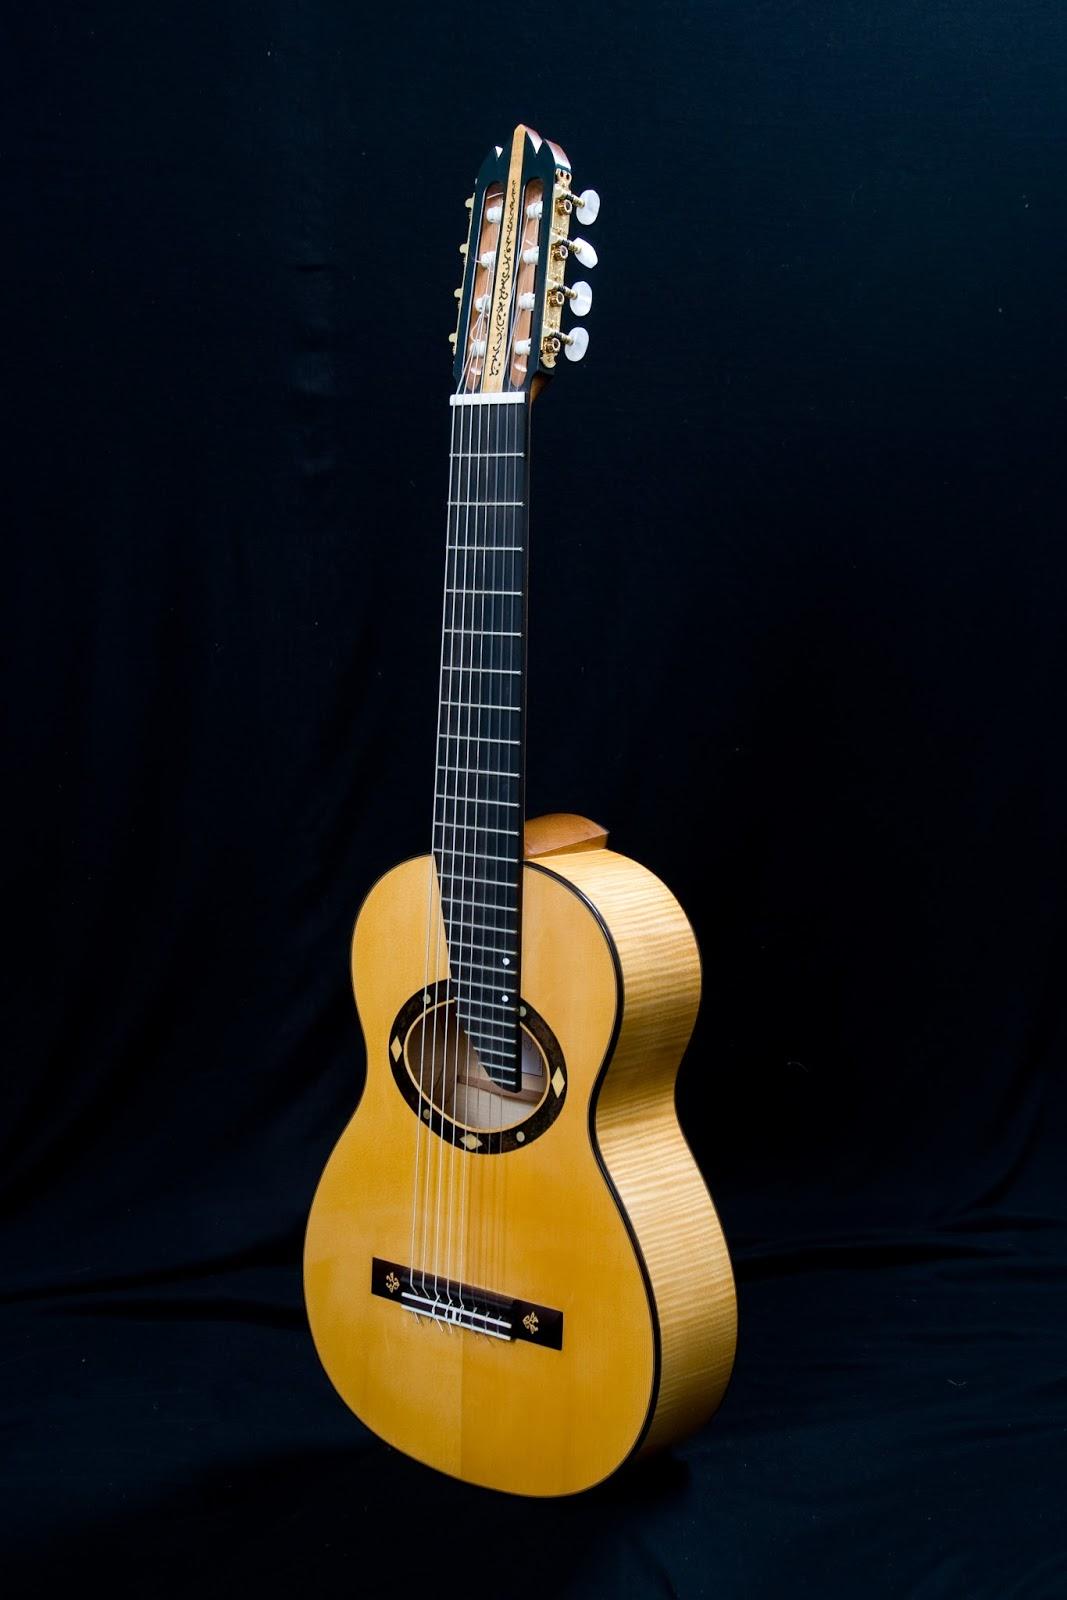 guitarras custom constru das por rodolfo cucculelli luthier 8stringed classical guitar abete. Black Bedroom Furniture Sets. Home Design Ideas